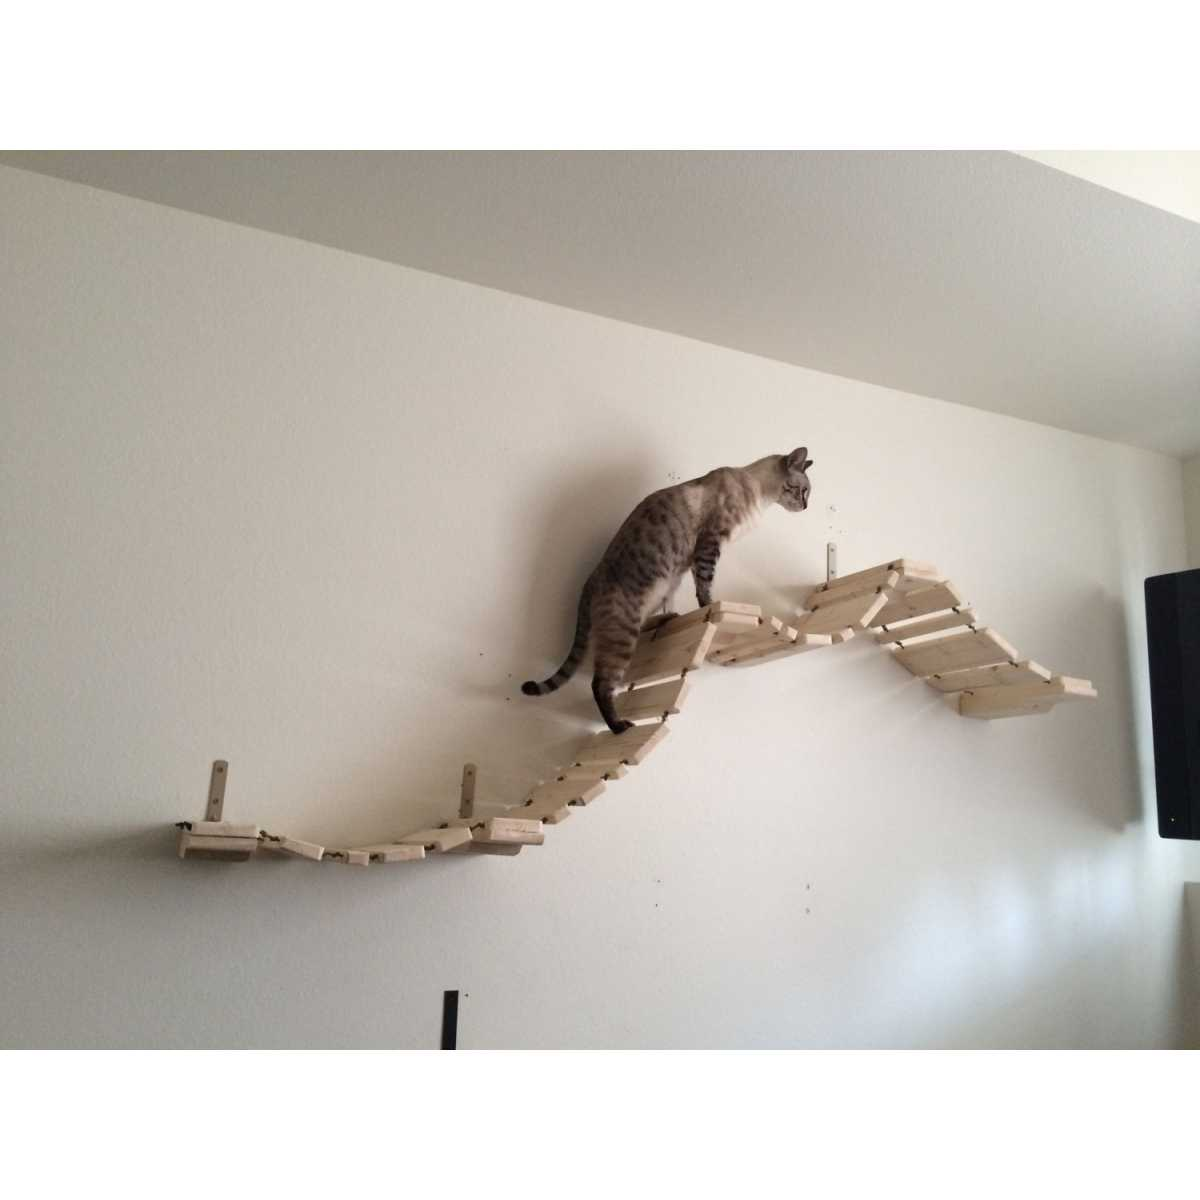 Catastrophicreations Deluxe Cat Wall Mounted Boardwalk